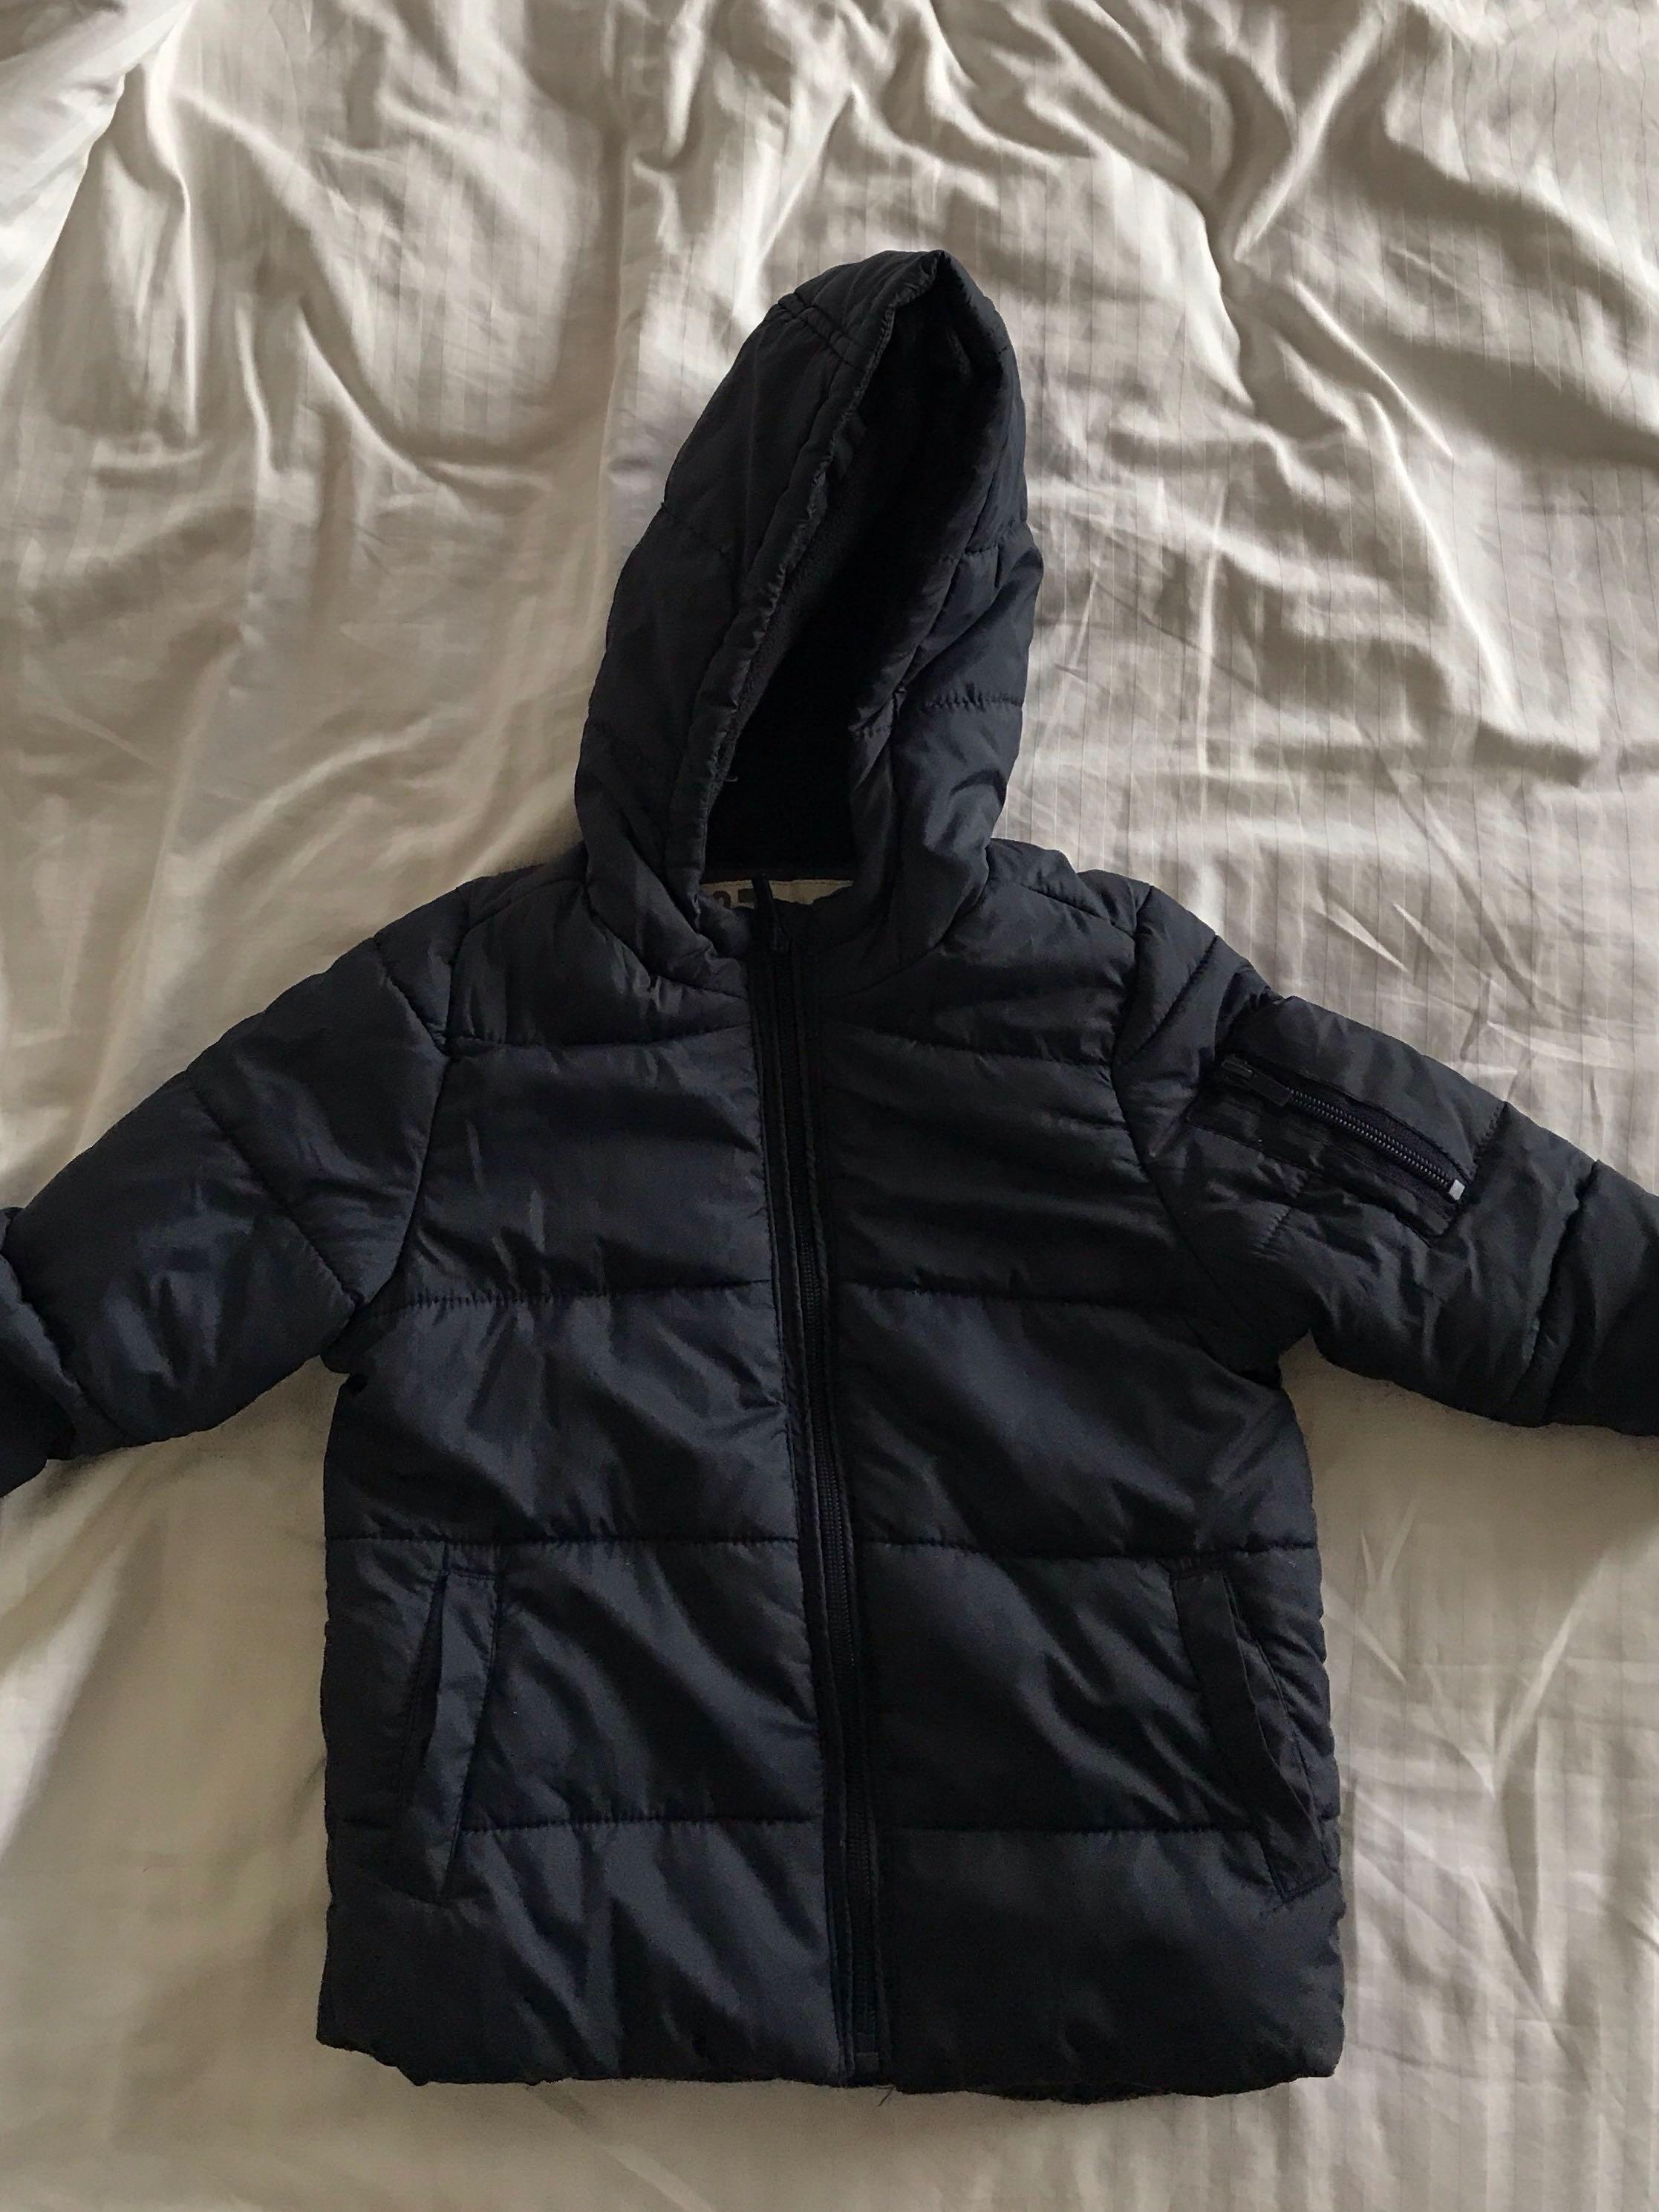 4ba0fd09fef3 Cotton On Winter jacket kids size 1 2 excellent condition